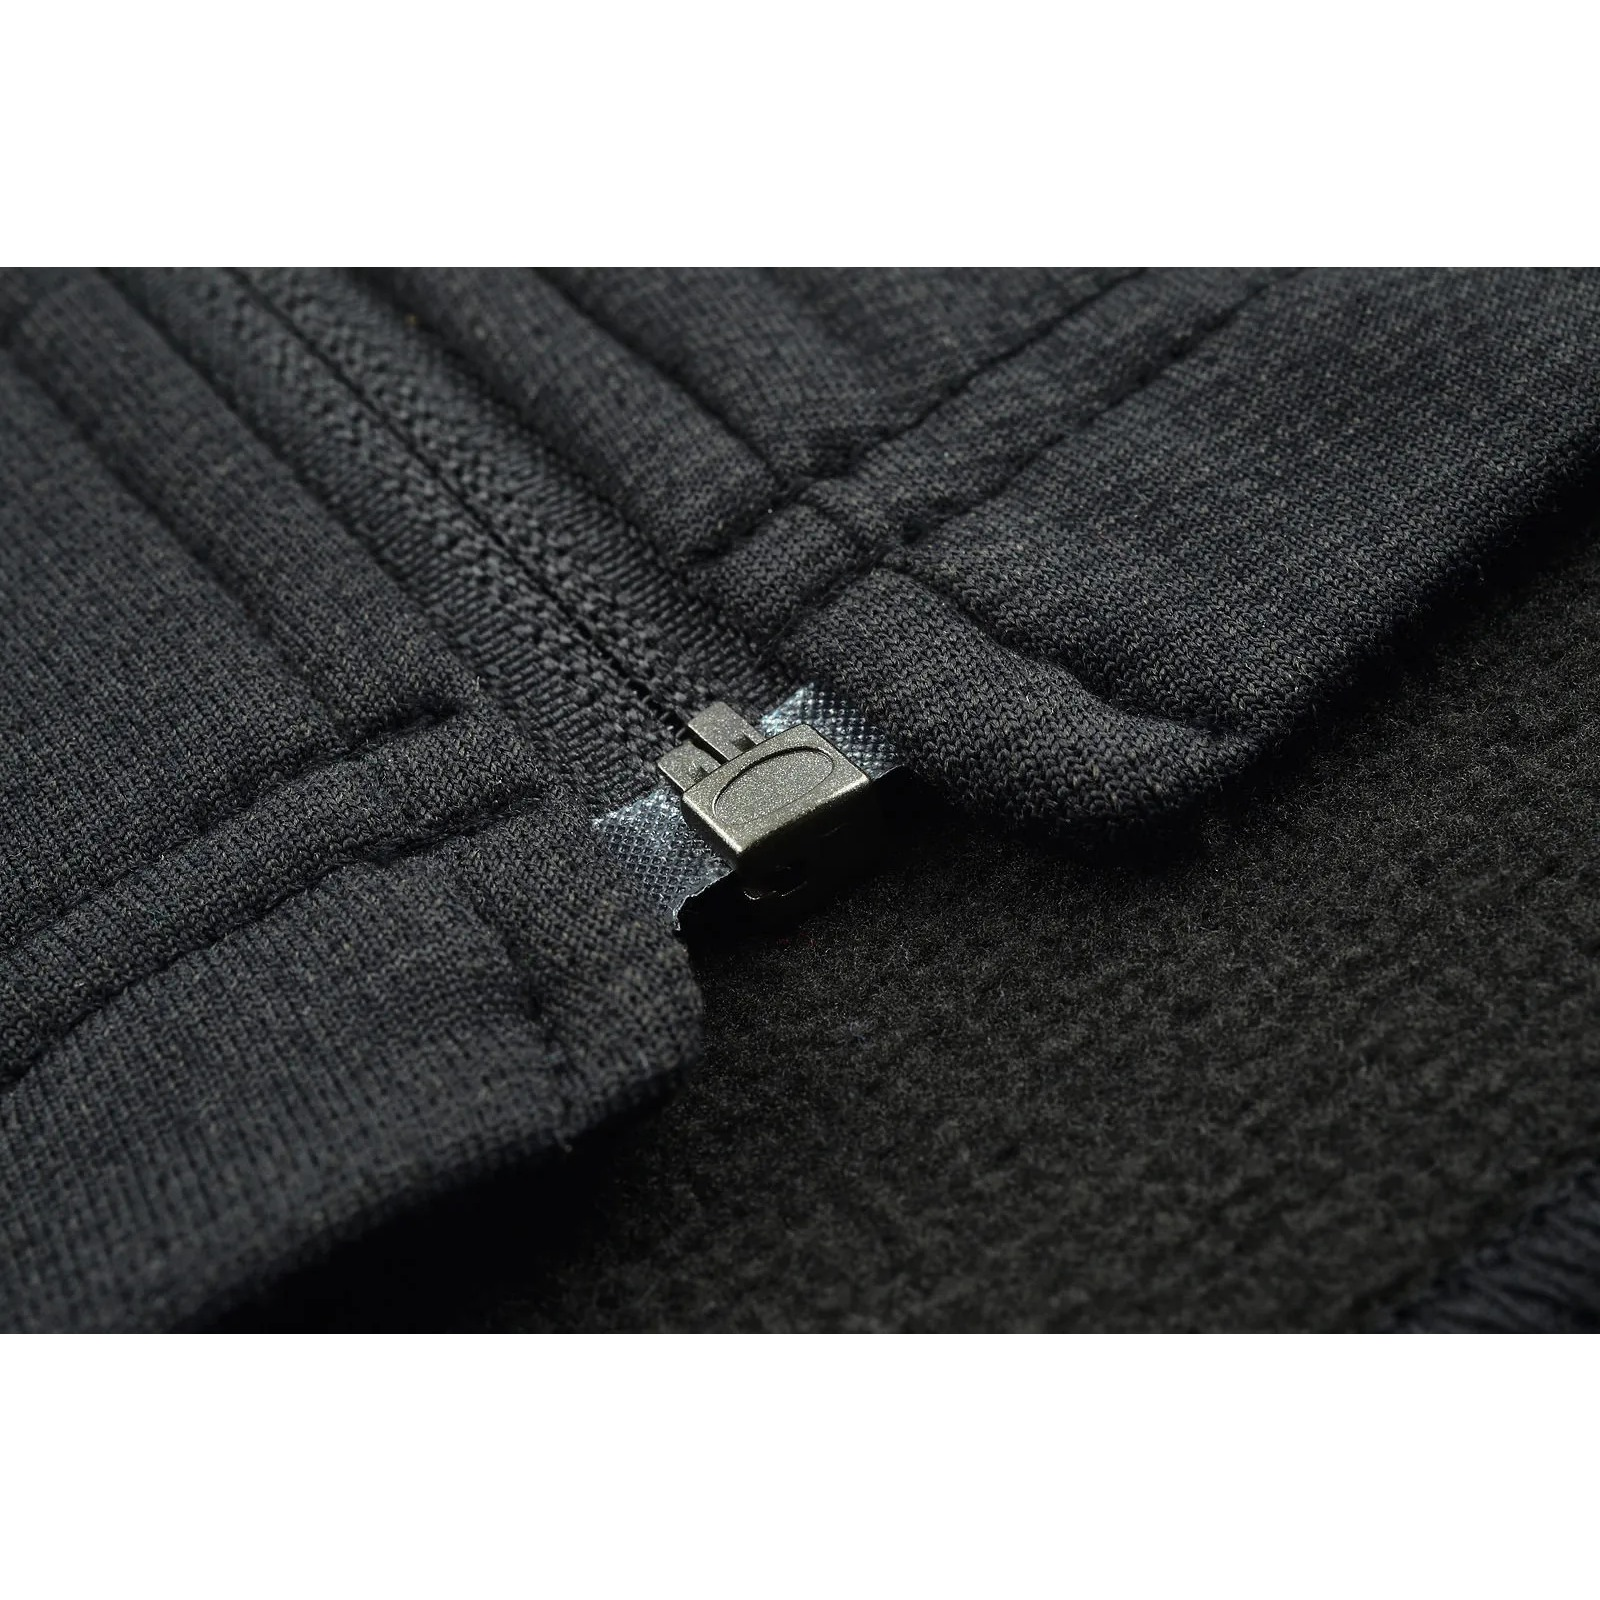 Imagen de 7mesh Apres Chaqueta con capucha para hombres - Black